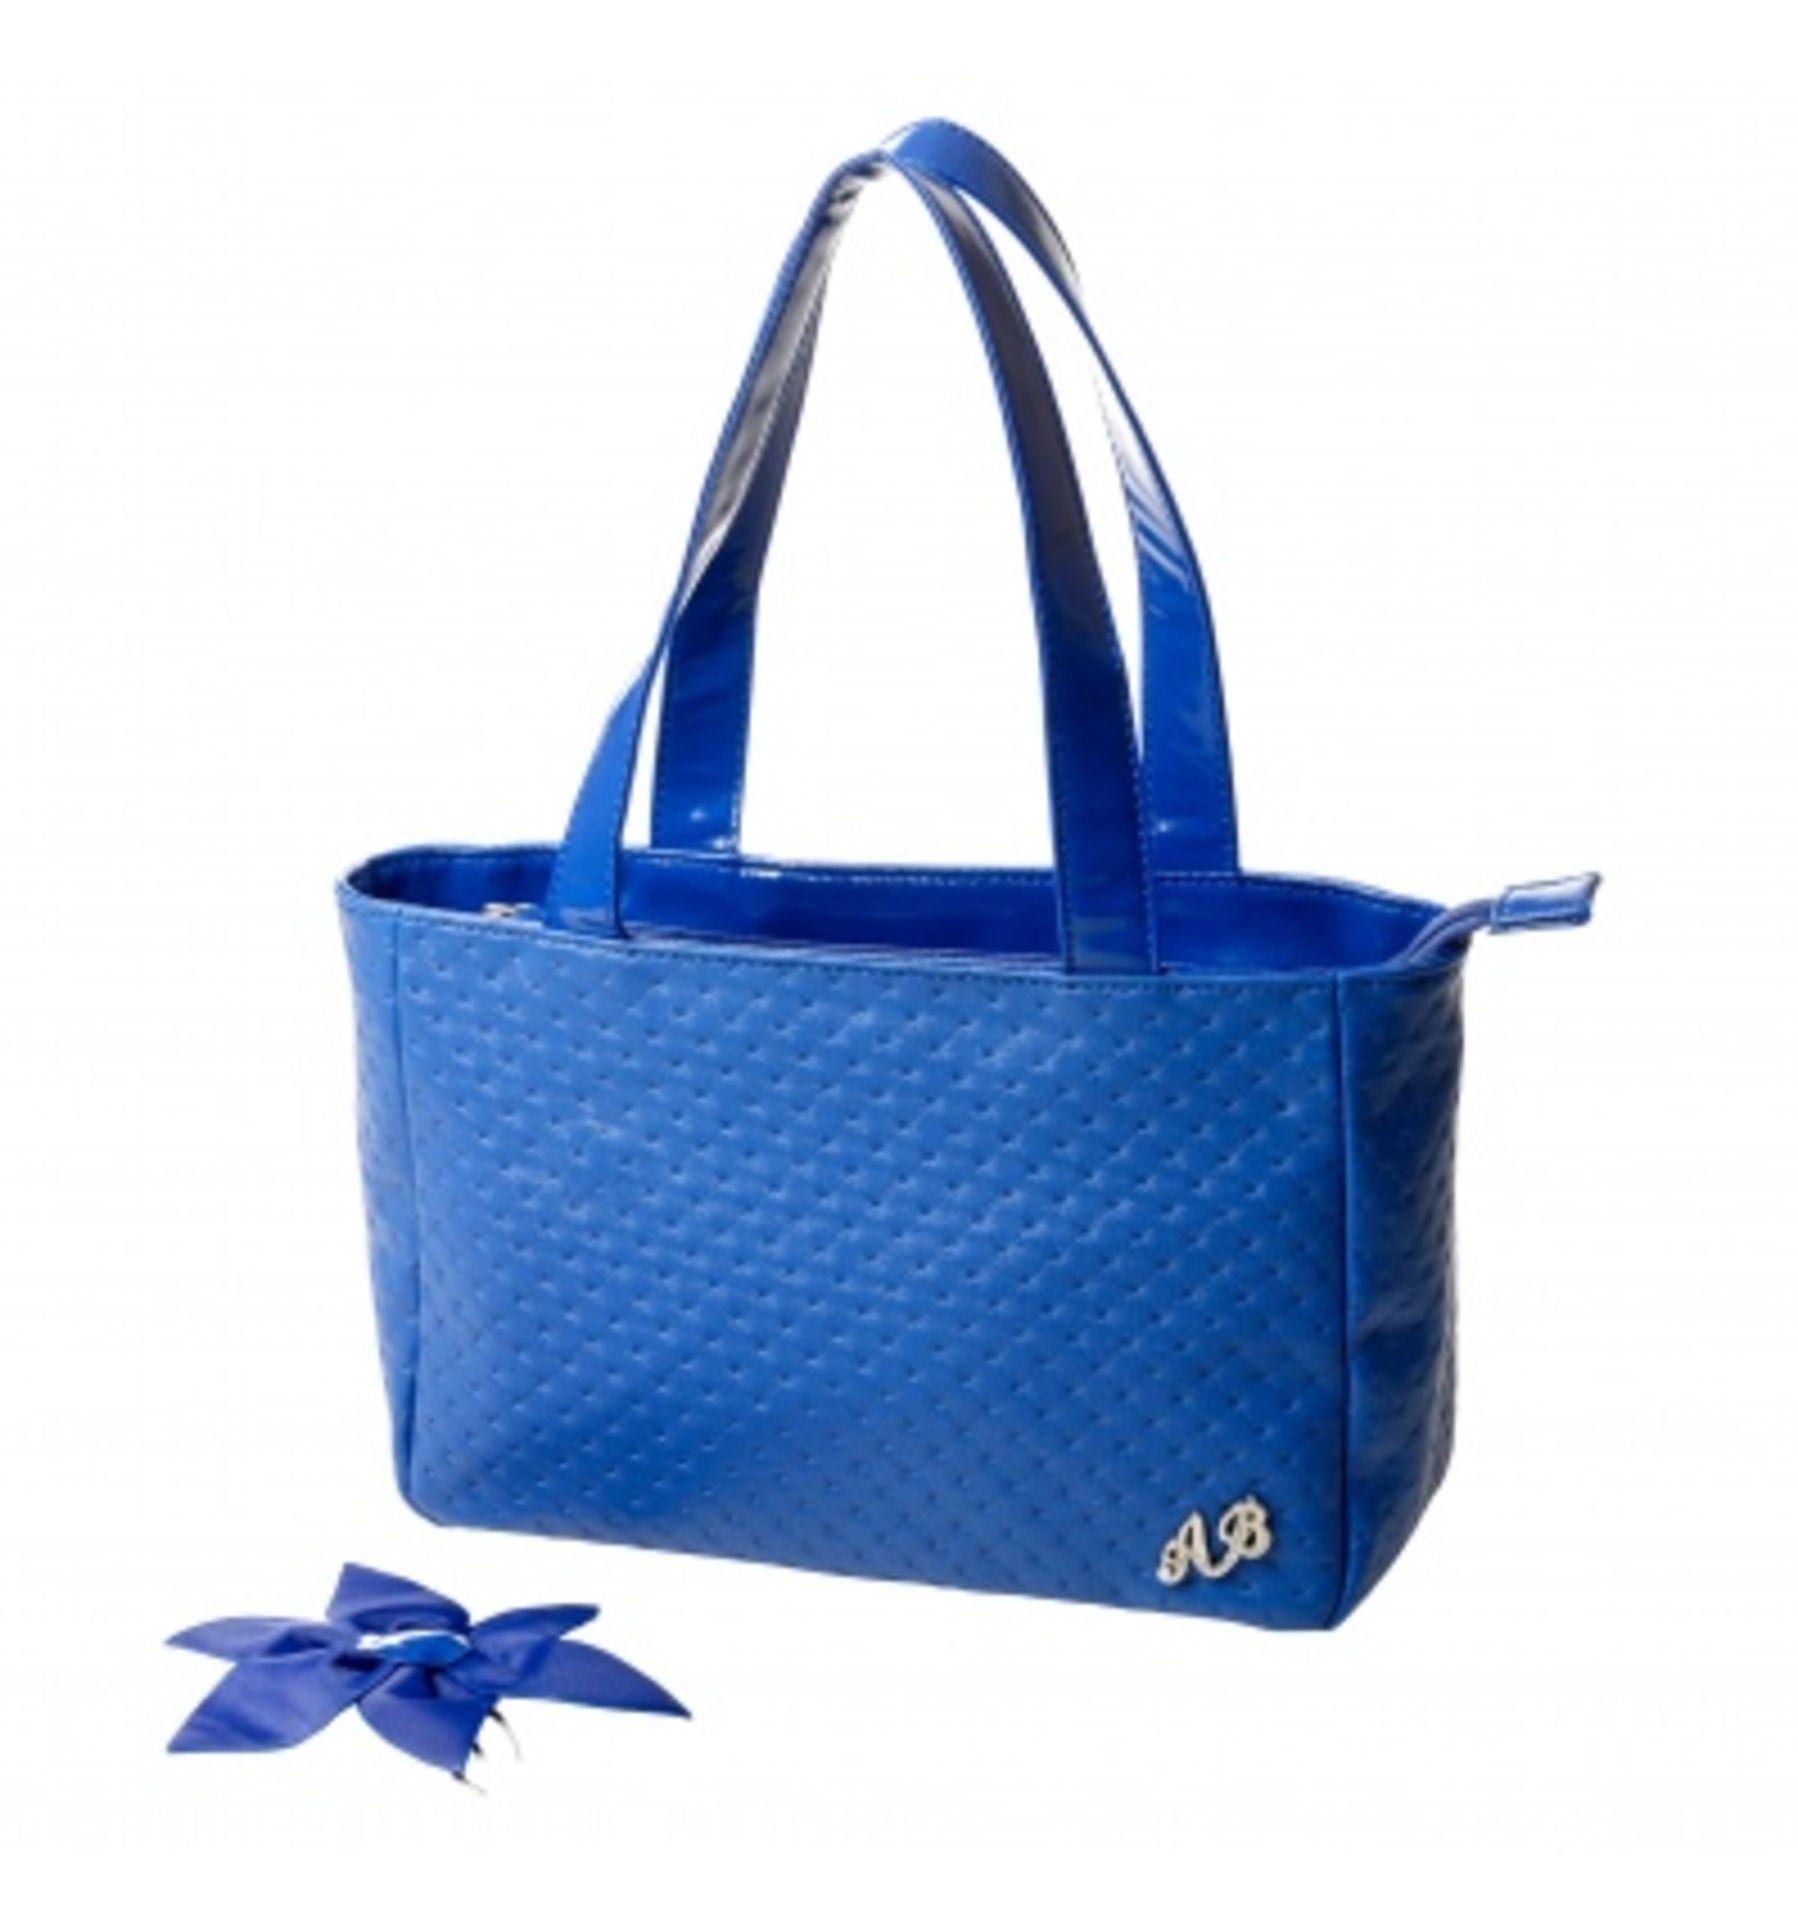 New - Ab Collizioni - Ladies Blue Handbags With Dust Bag